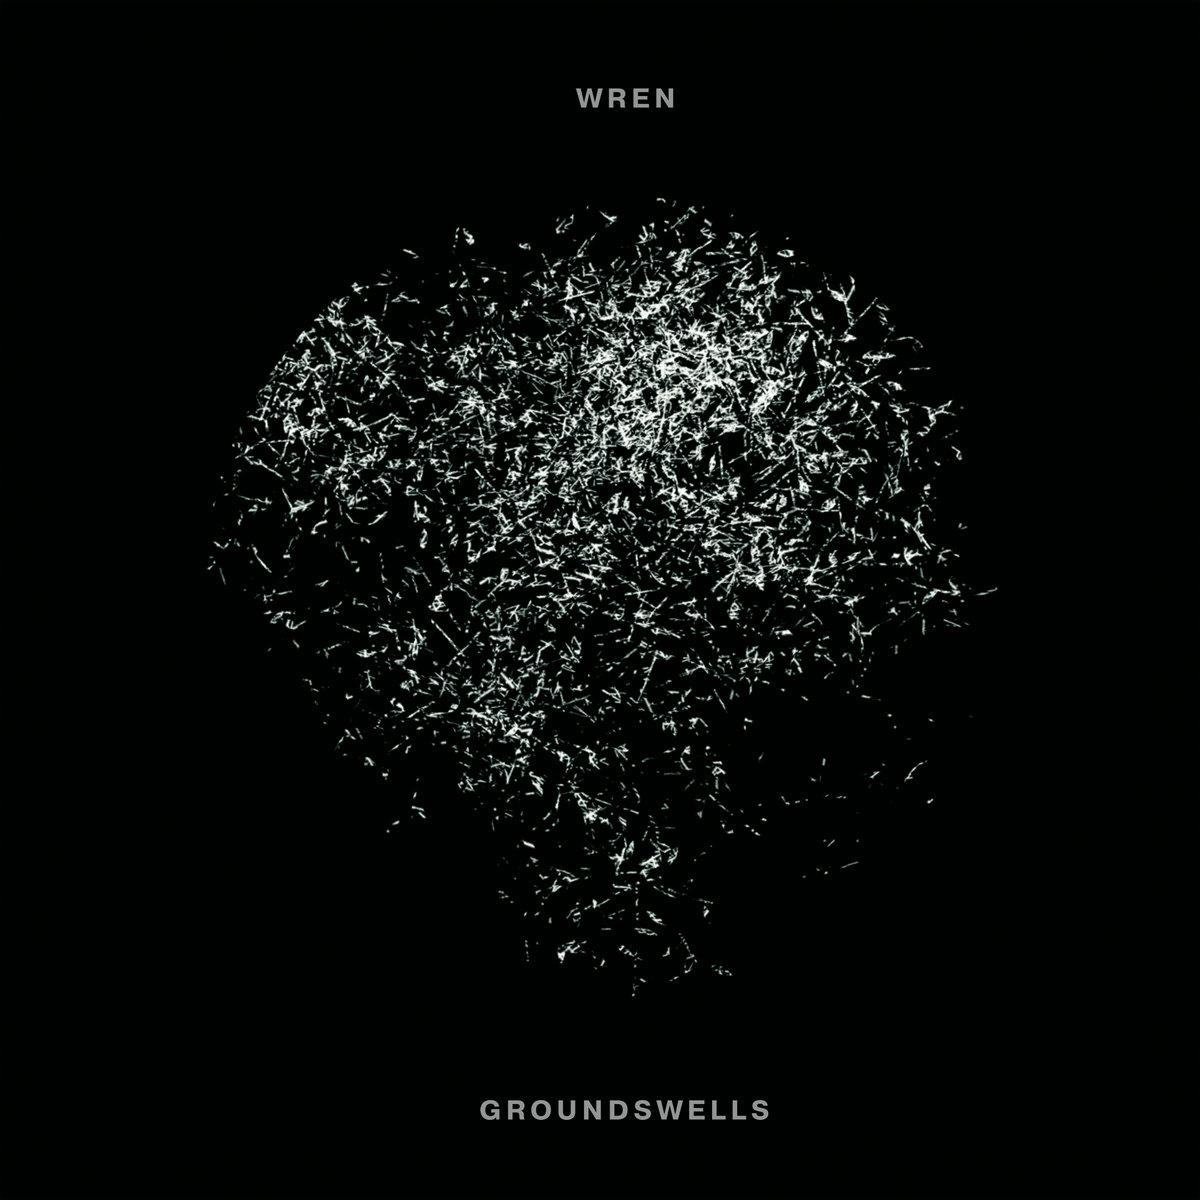 GROUNDSWELLS | Wren